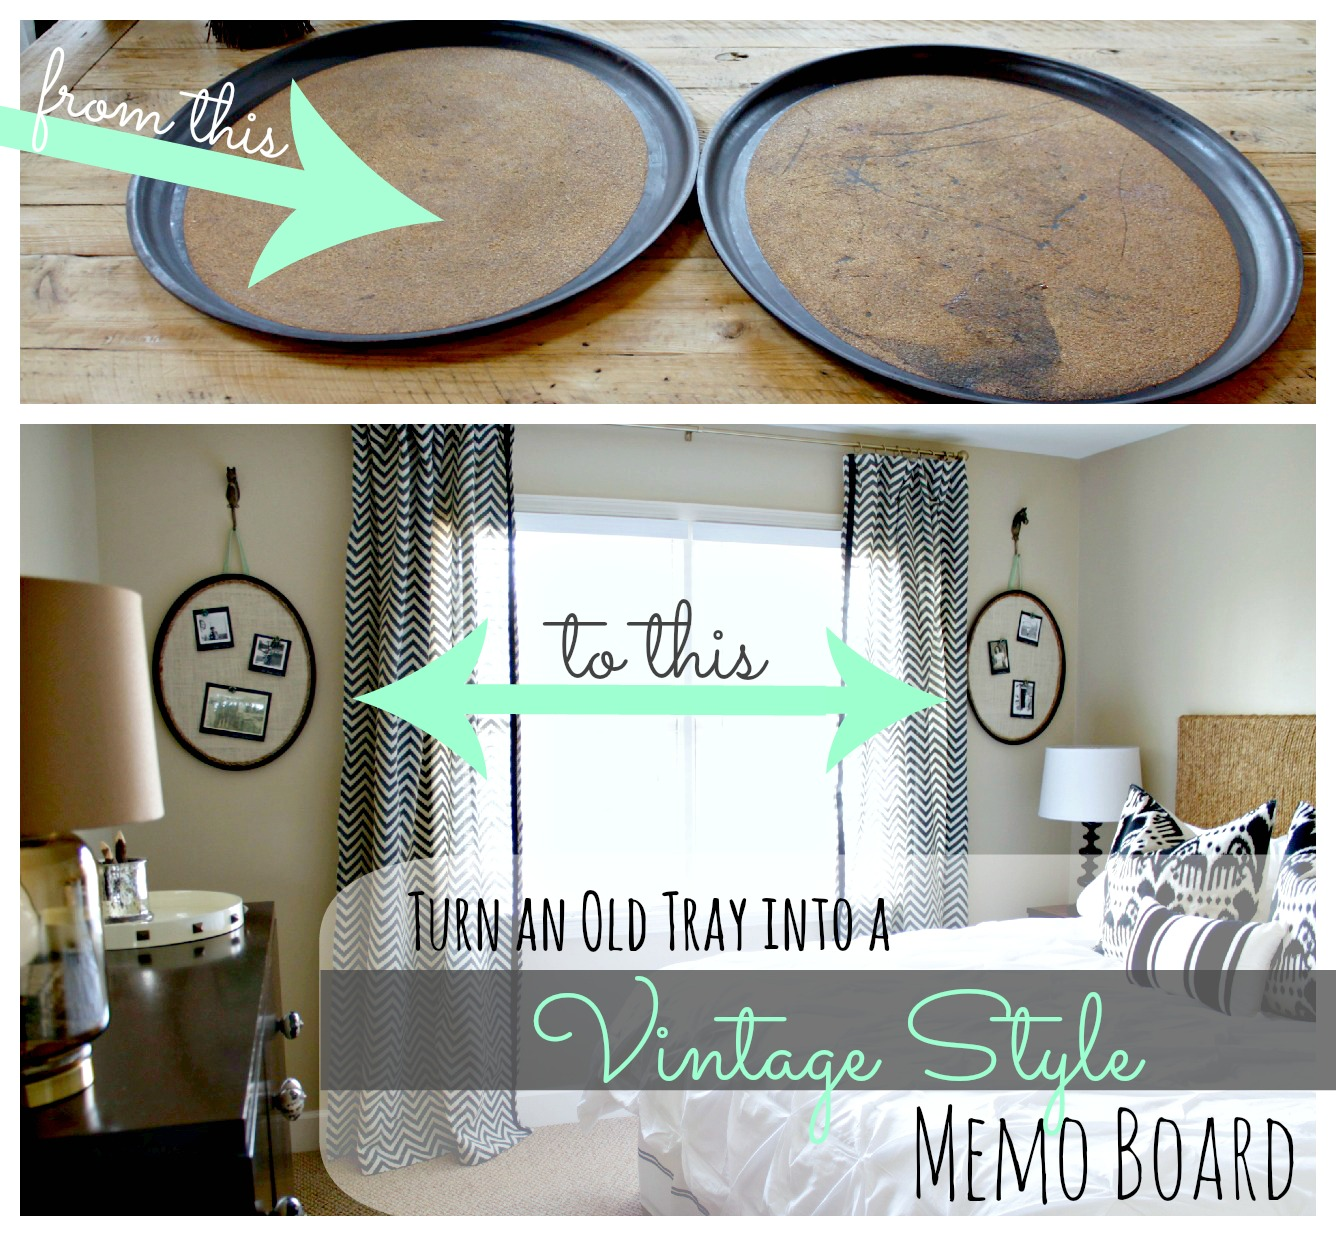 decorative corkboard memo board - infarrantly creative